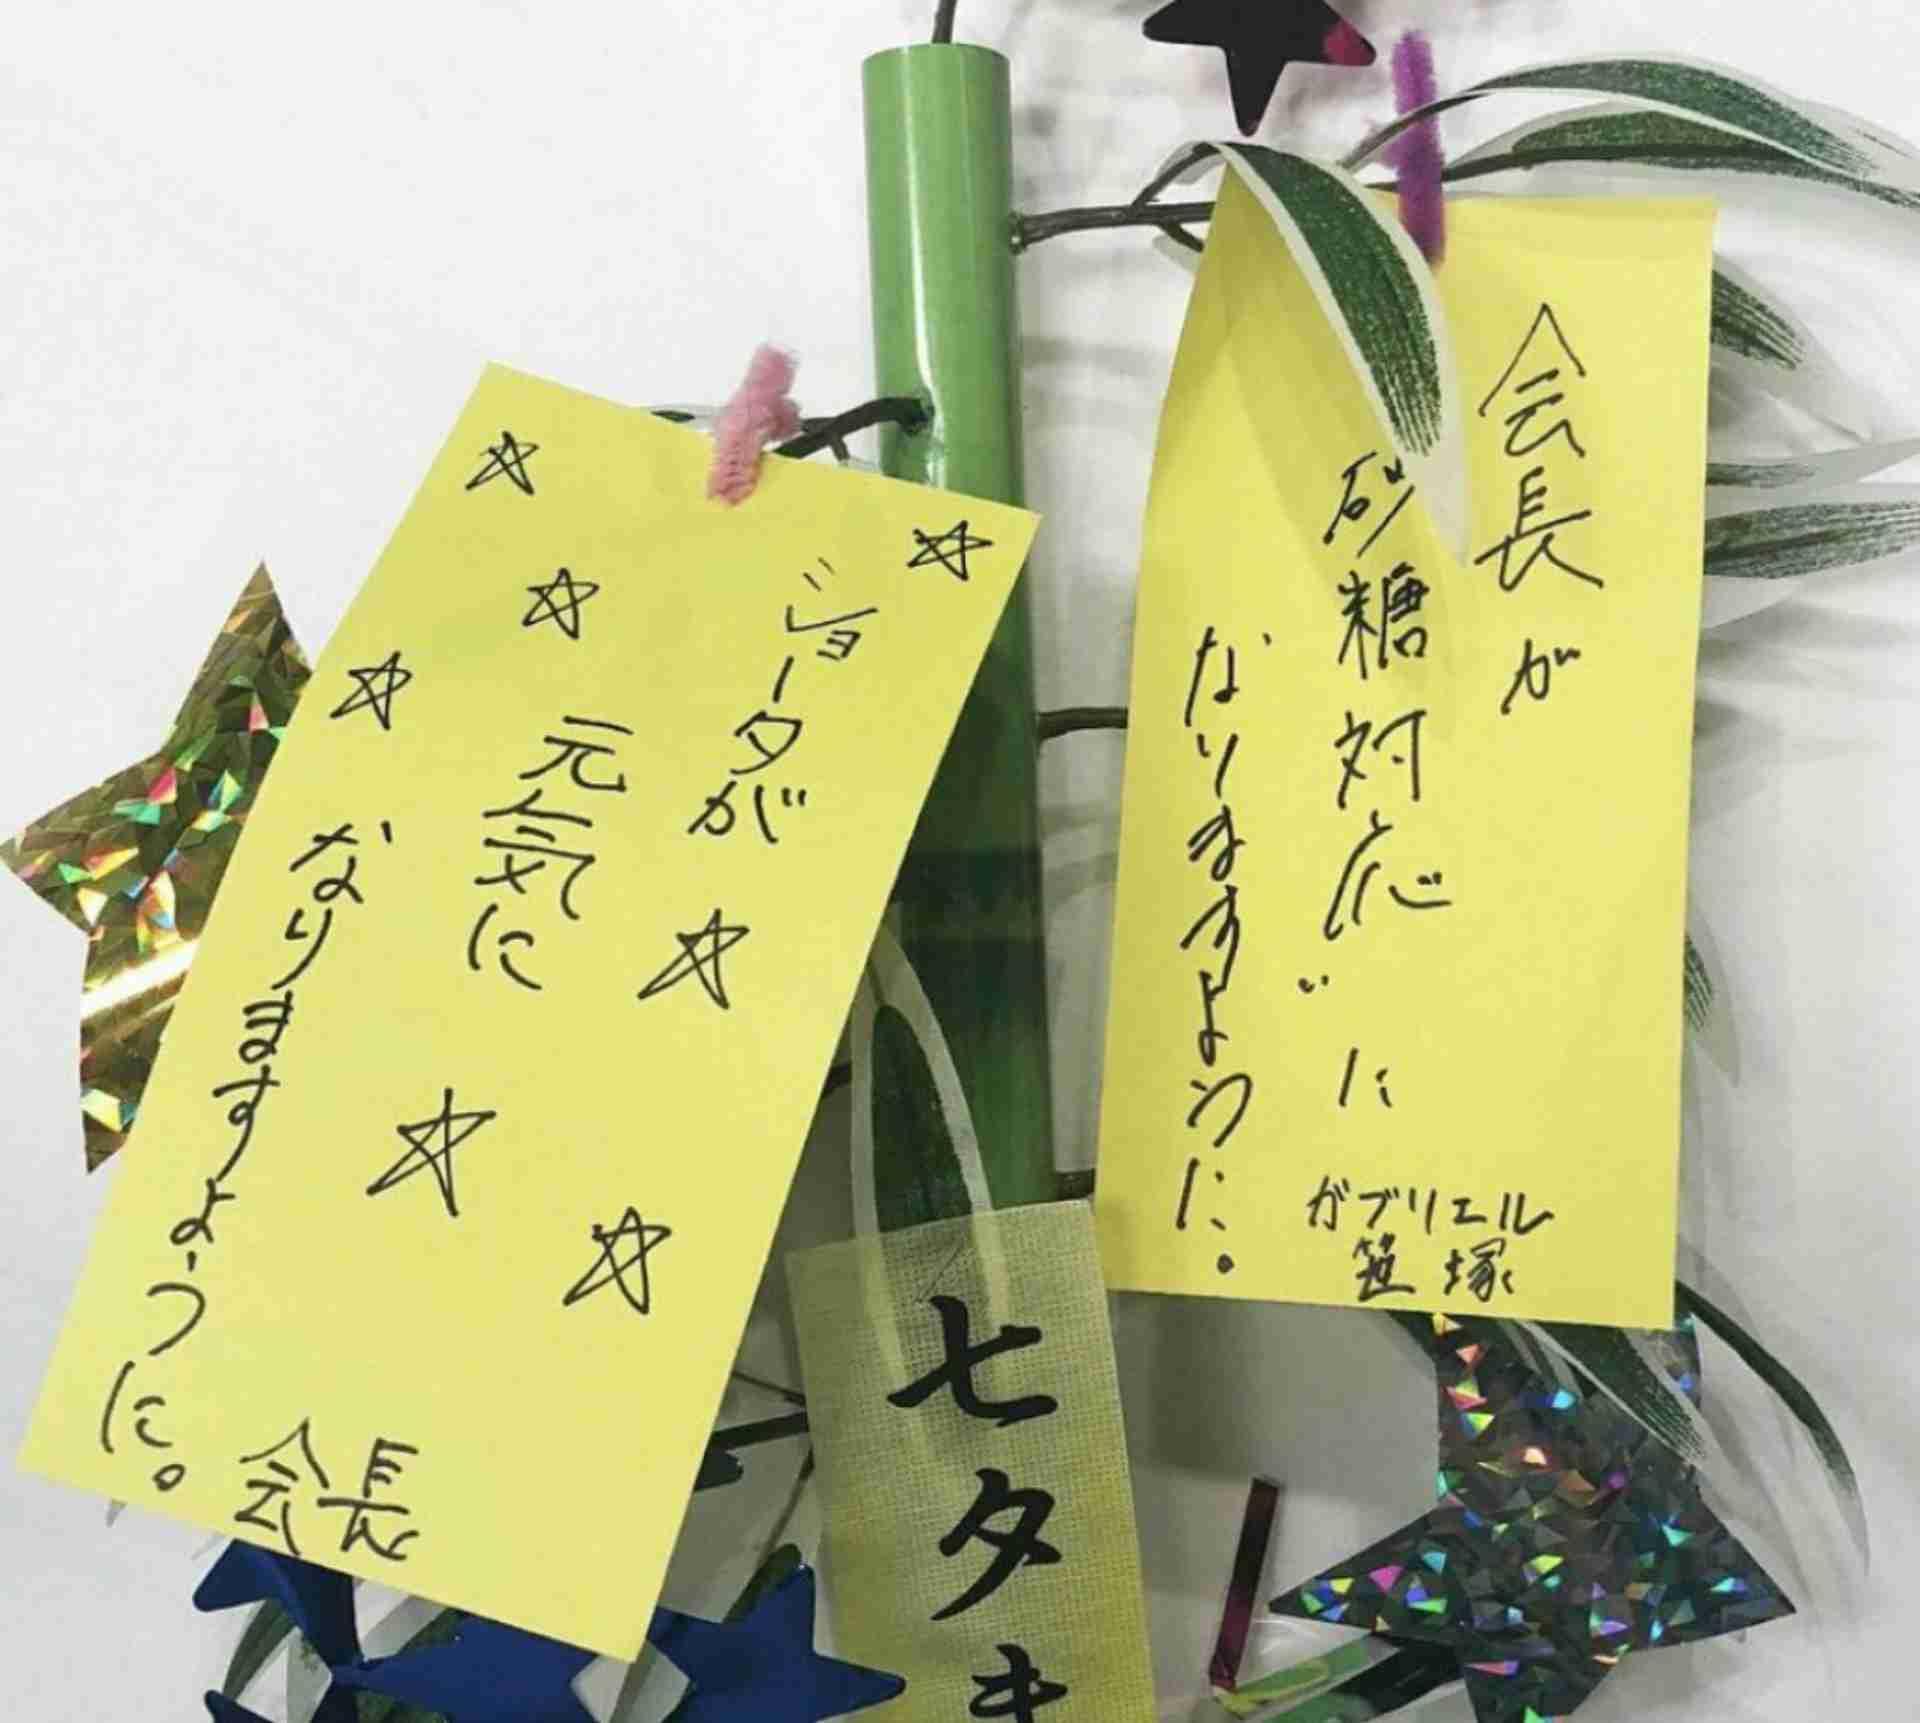 FANTASTICS・中尾翔太さんが死去 22歳 胃がん治療で3月から活動休止